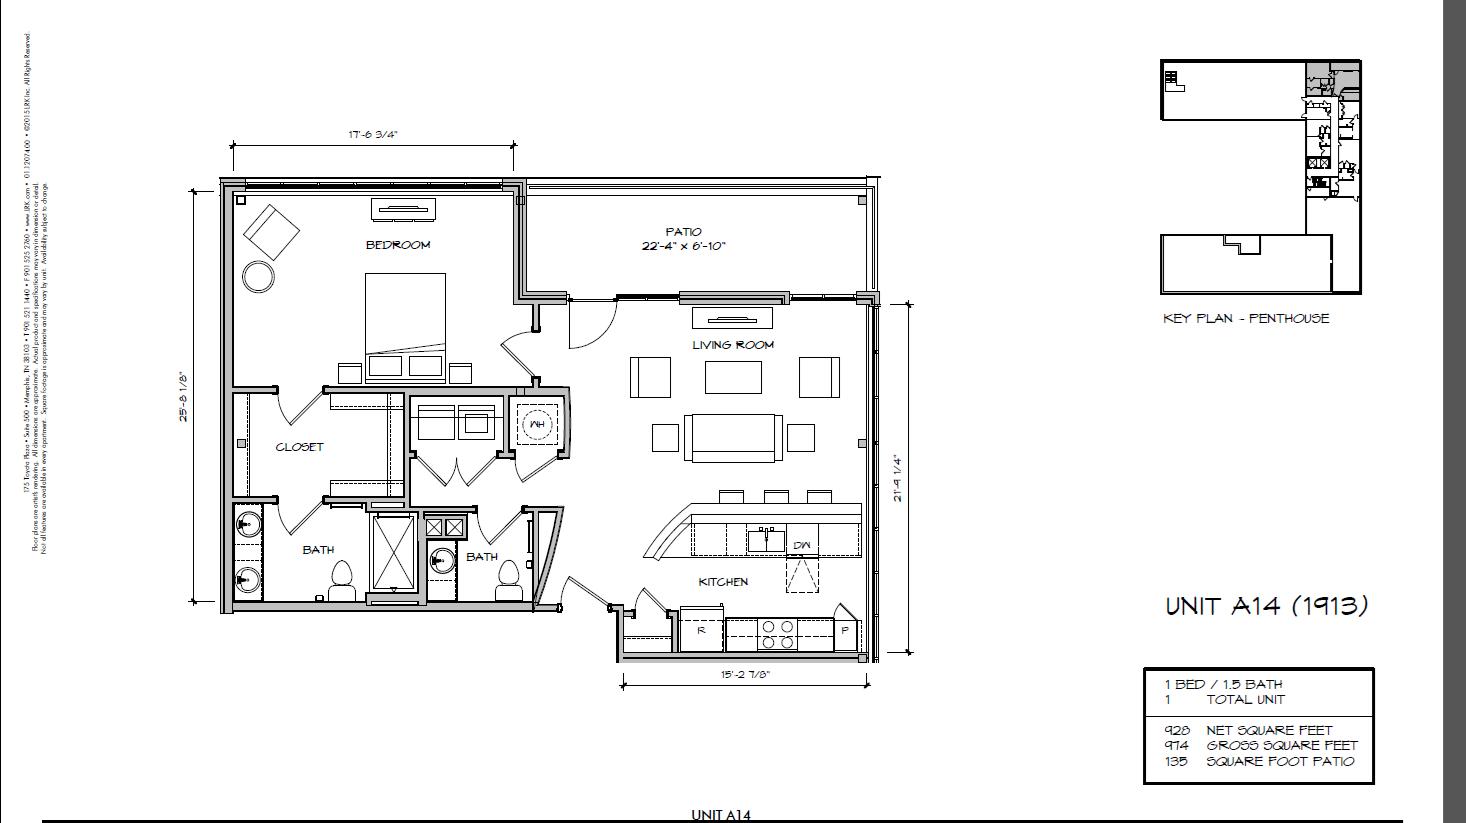 A14 - 1913 Floor Plan 4